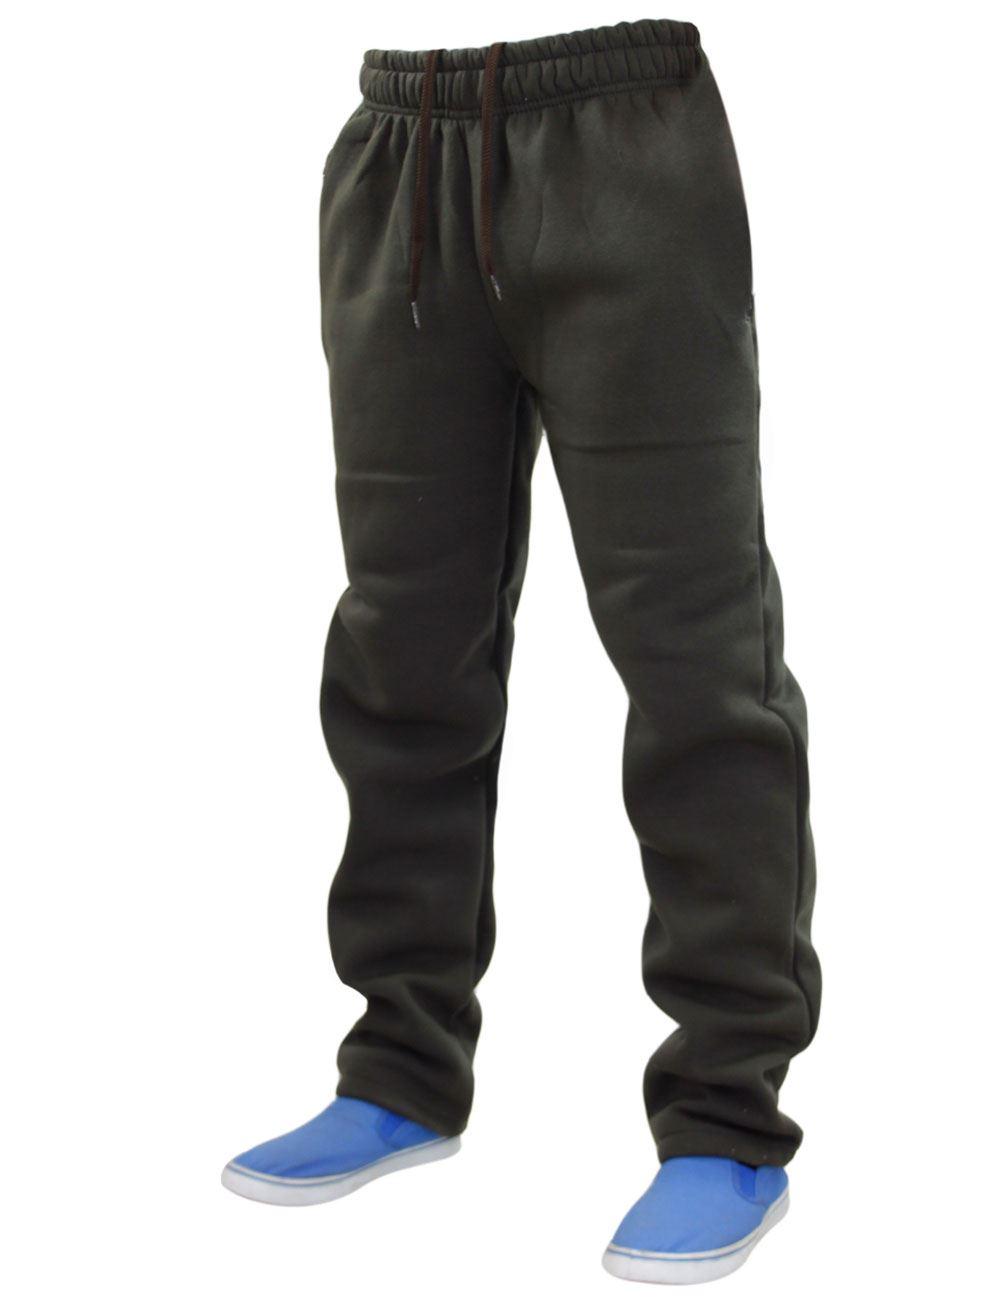 Mens-Women-Plain-Fleece-Joggers-Bottoms-Jogging-Pant-Gym-Fitness-Sports-Trousers thumbnail 7